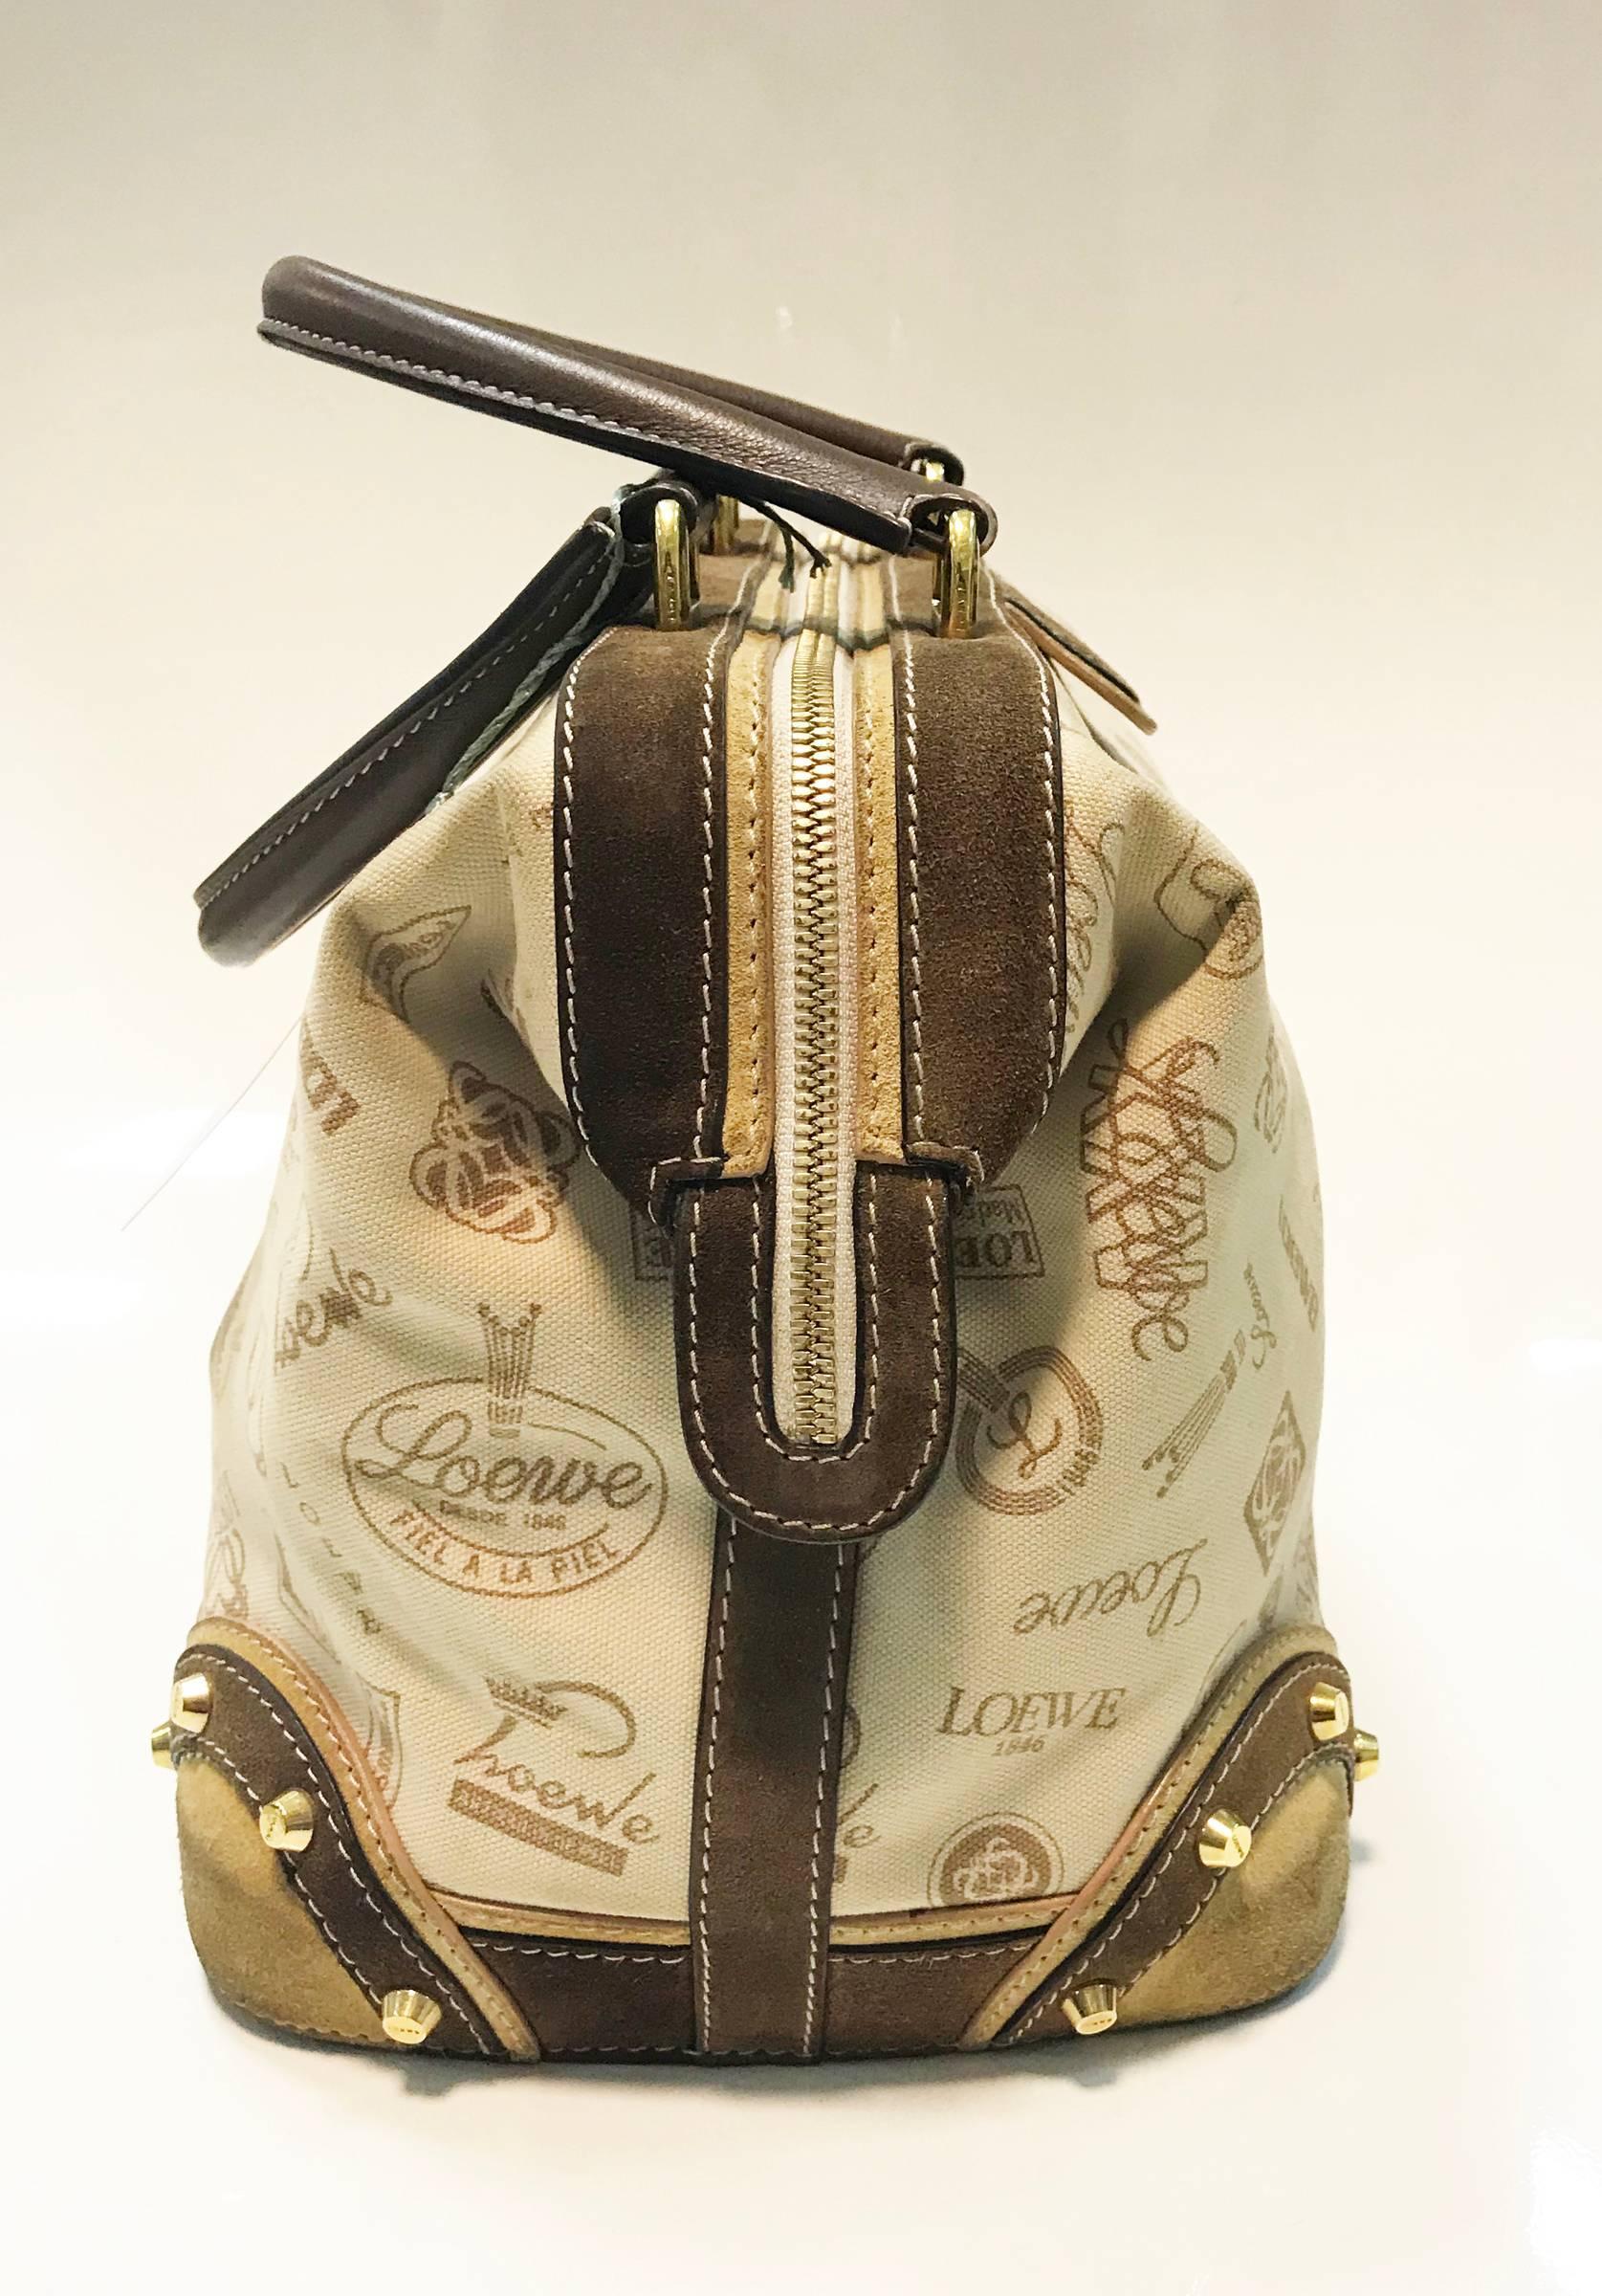 1stdibs Loewe 160 Anniversary Bowling Bag. 2006. Spain qqJ4a6H66P